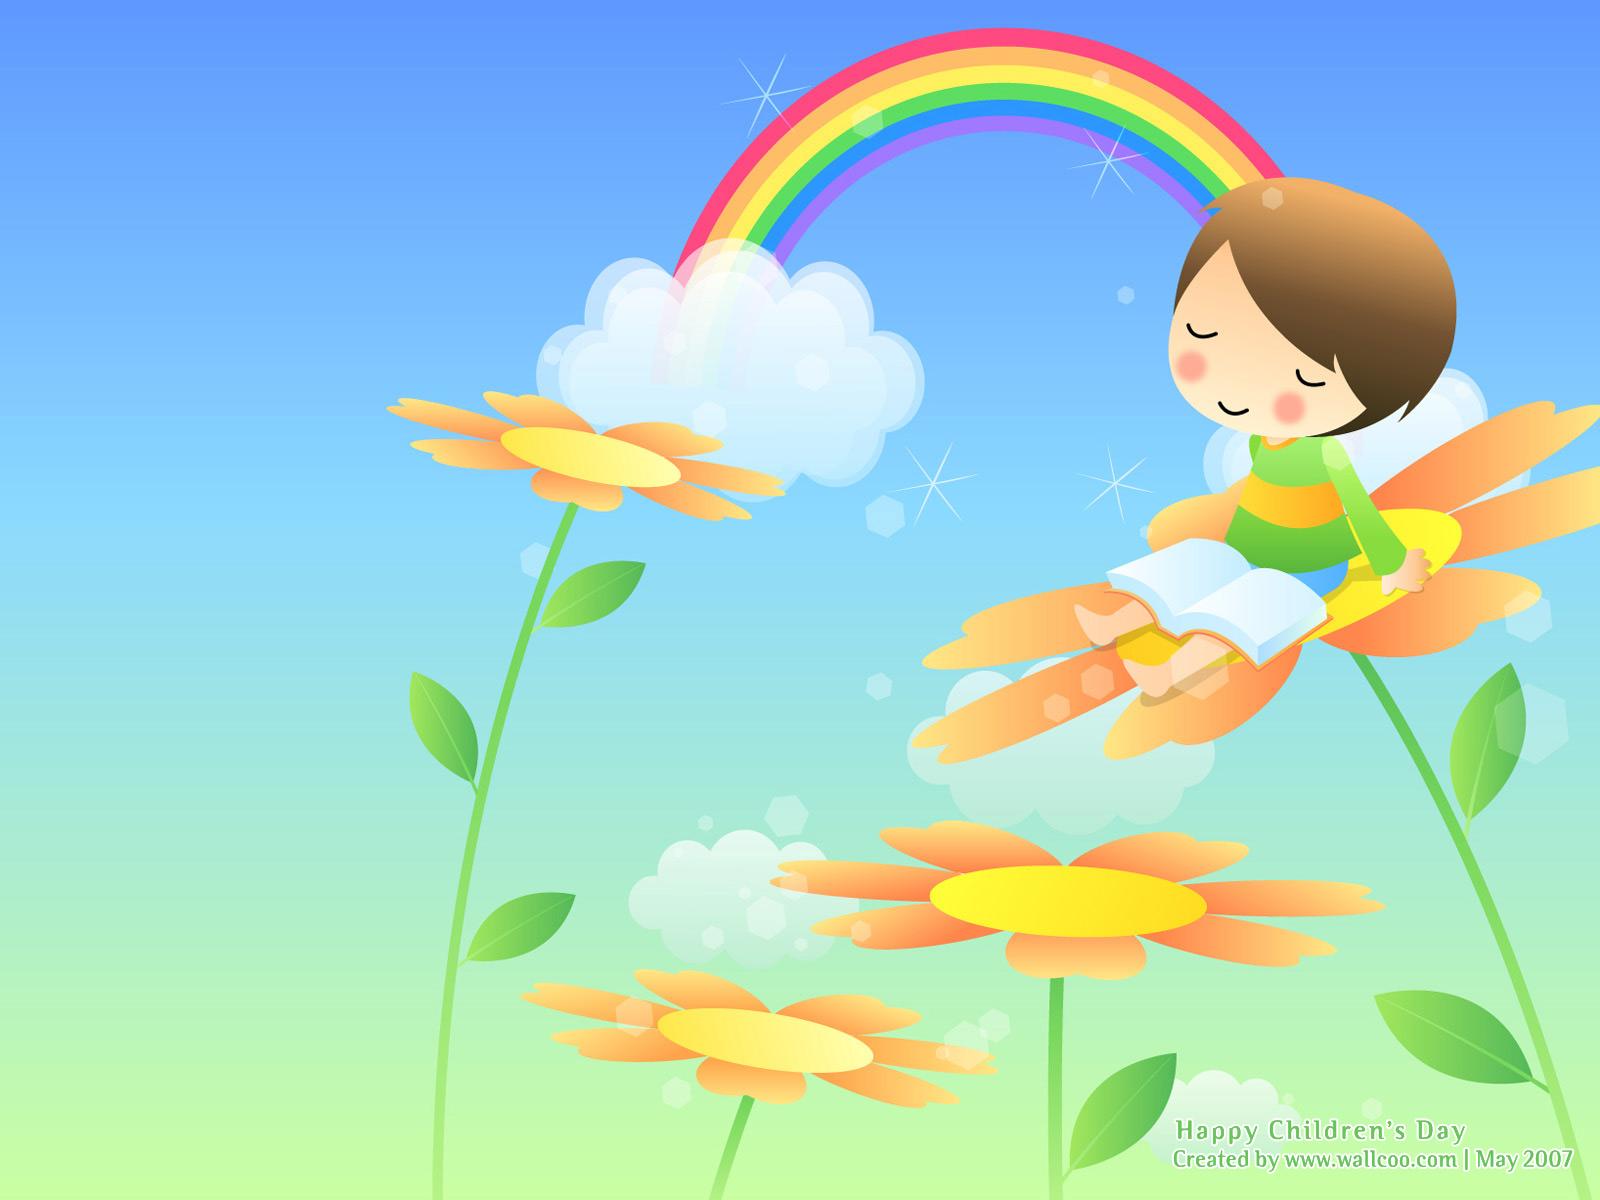 http://3.bp.blogspot.com/_fCMwSkepyGk/SwleSnHBoNI/AAAAAAAACxc/OajWvKmk8OA/s1600/Children_Day_vector_wallpaper_03-761958.jpg